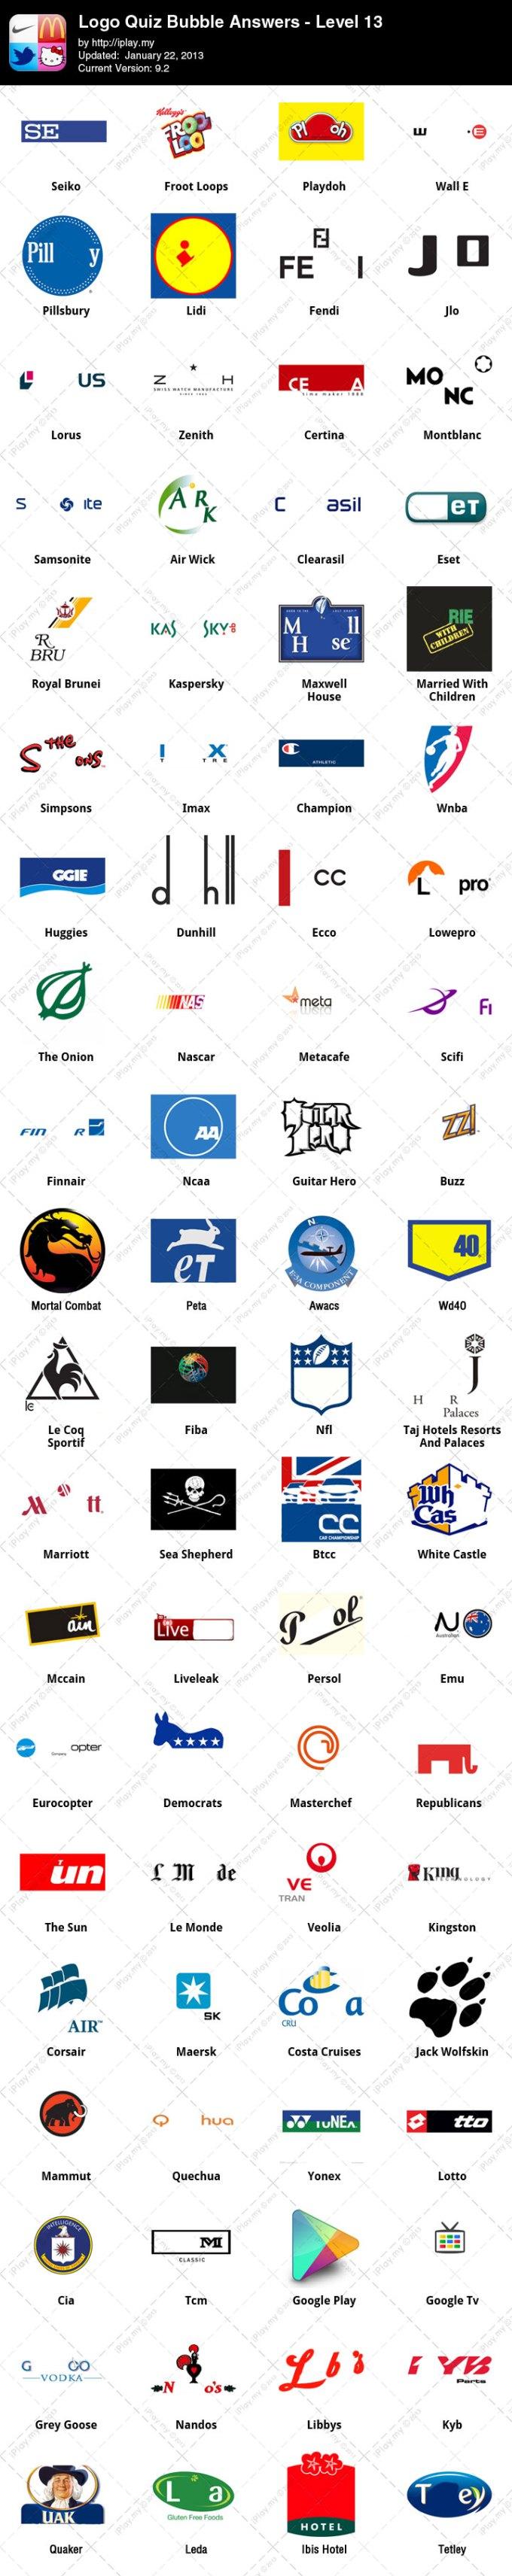 Top Five Gouci Logo Quiz Answers Level 13 - Circus